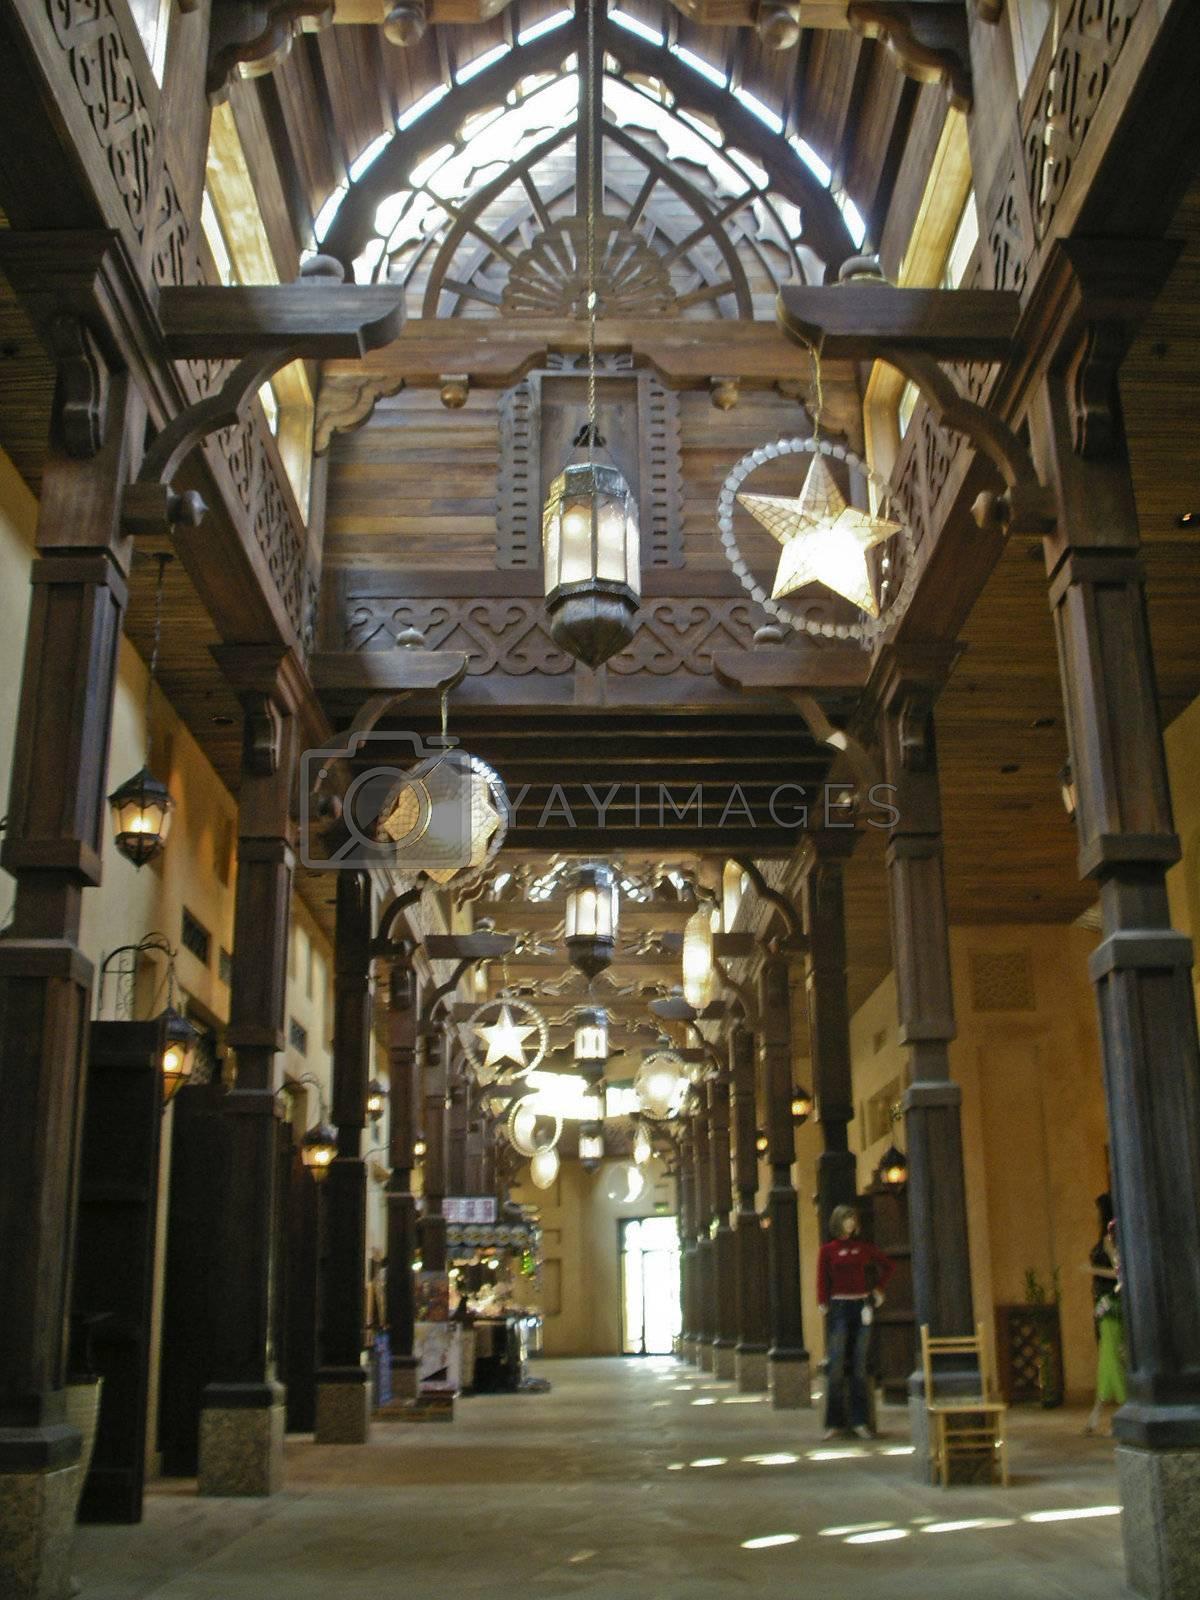 Souk Madinat Jumeirah shopping mall, Dubai by cvail73